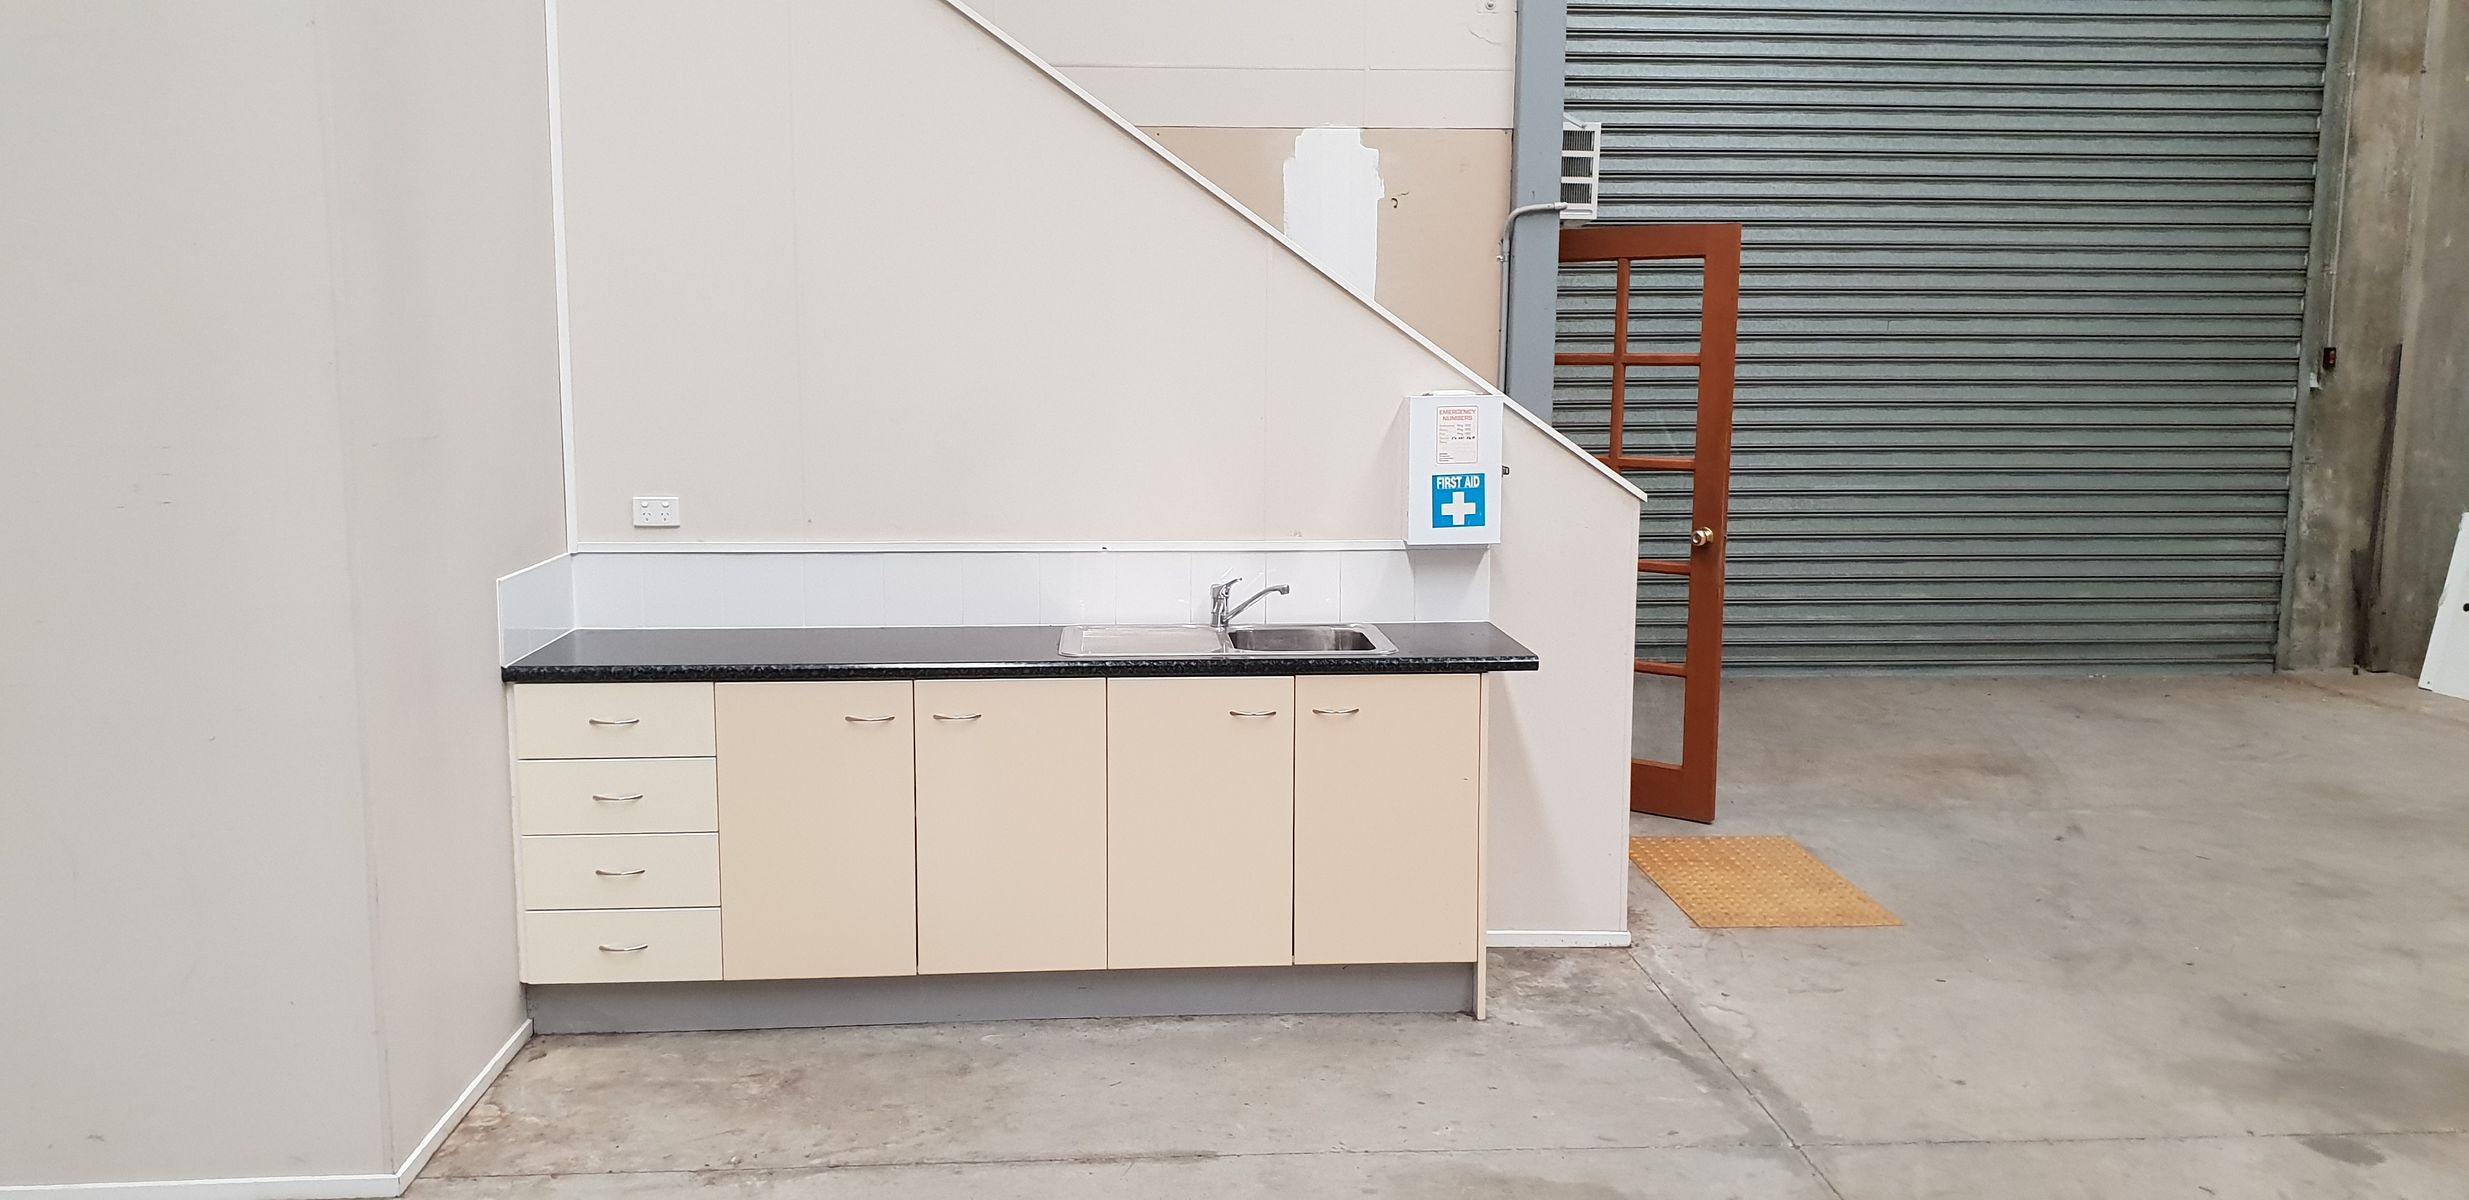 Unit 10, 7 Sonia Court, Raceview, QLD 4305